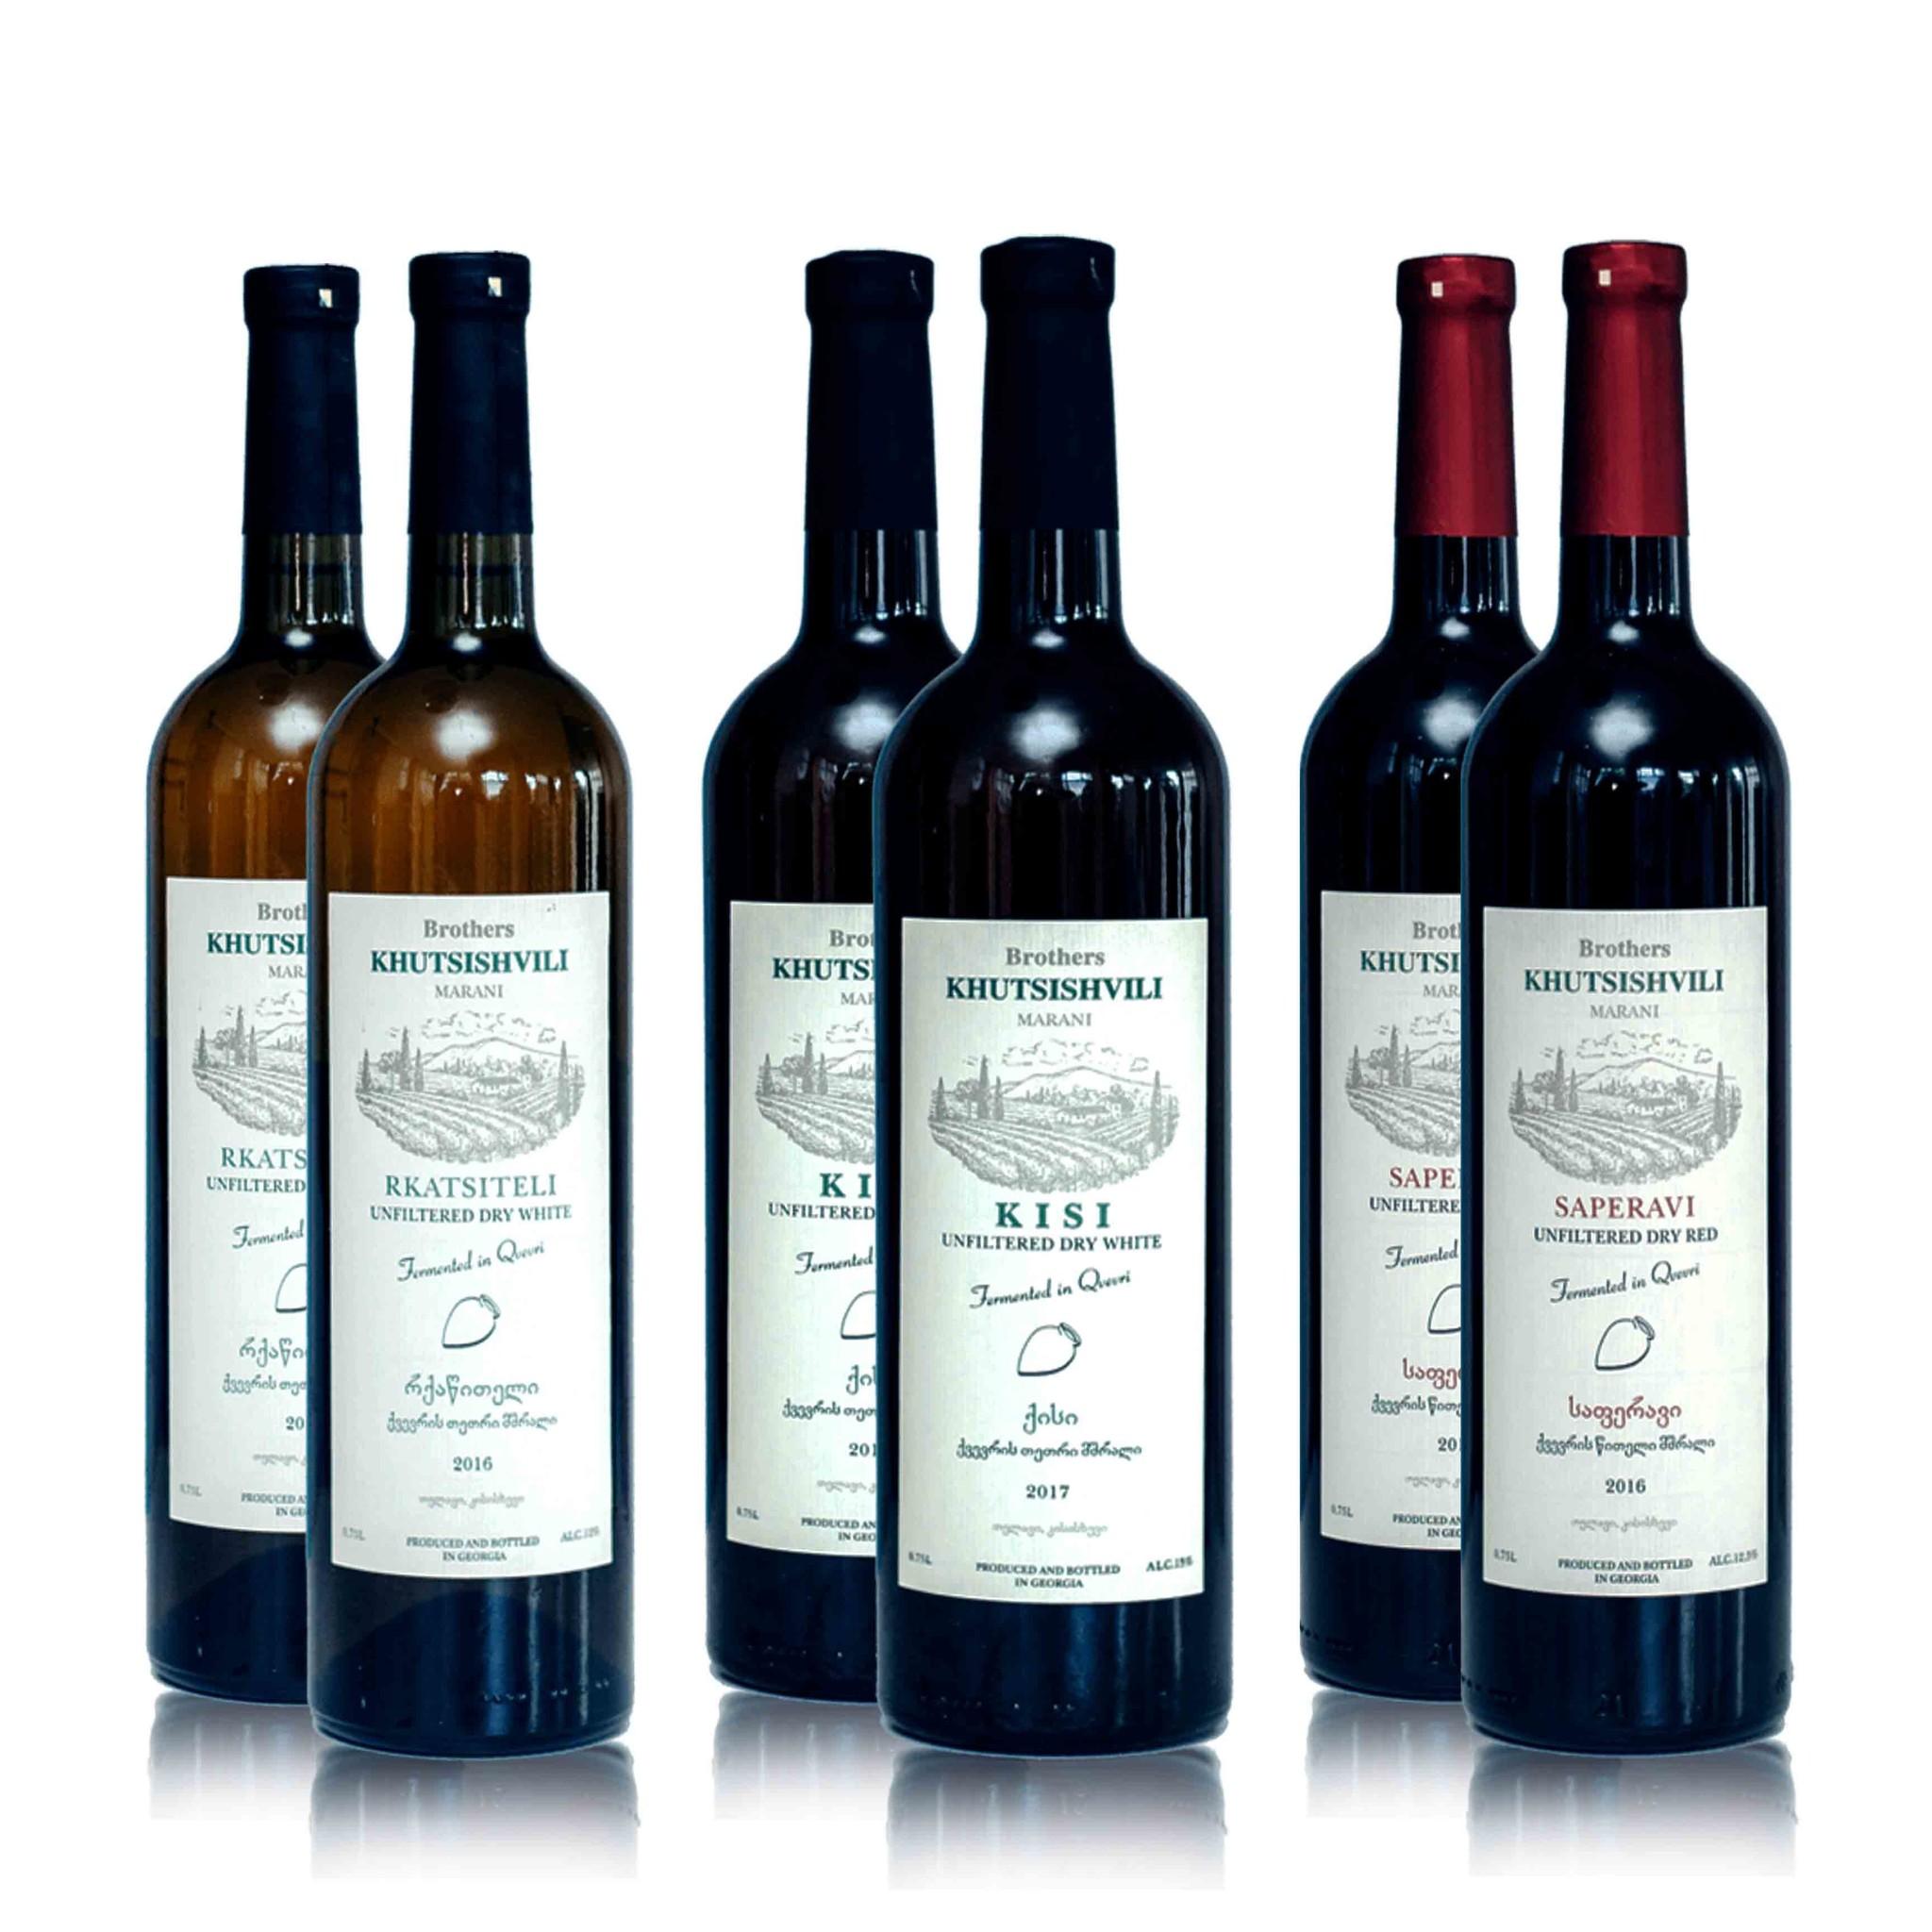 Wijn proefpakket Khutsishvilli Amber en Rood (6x)